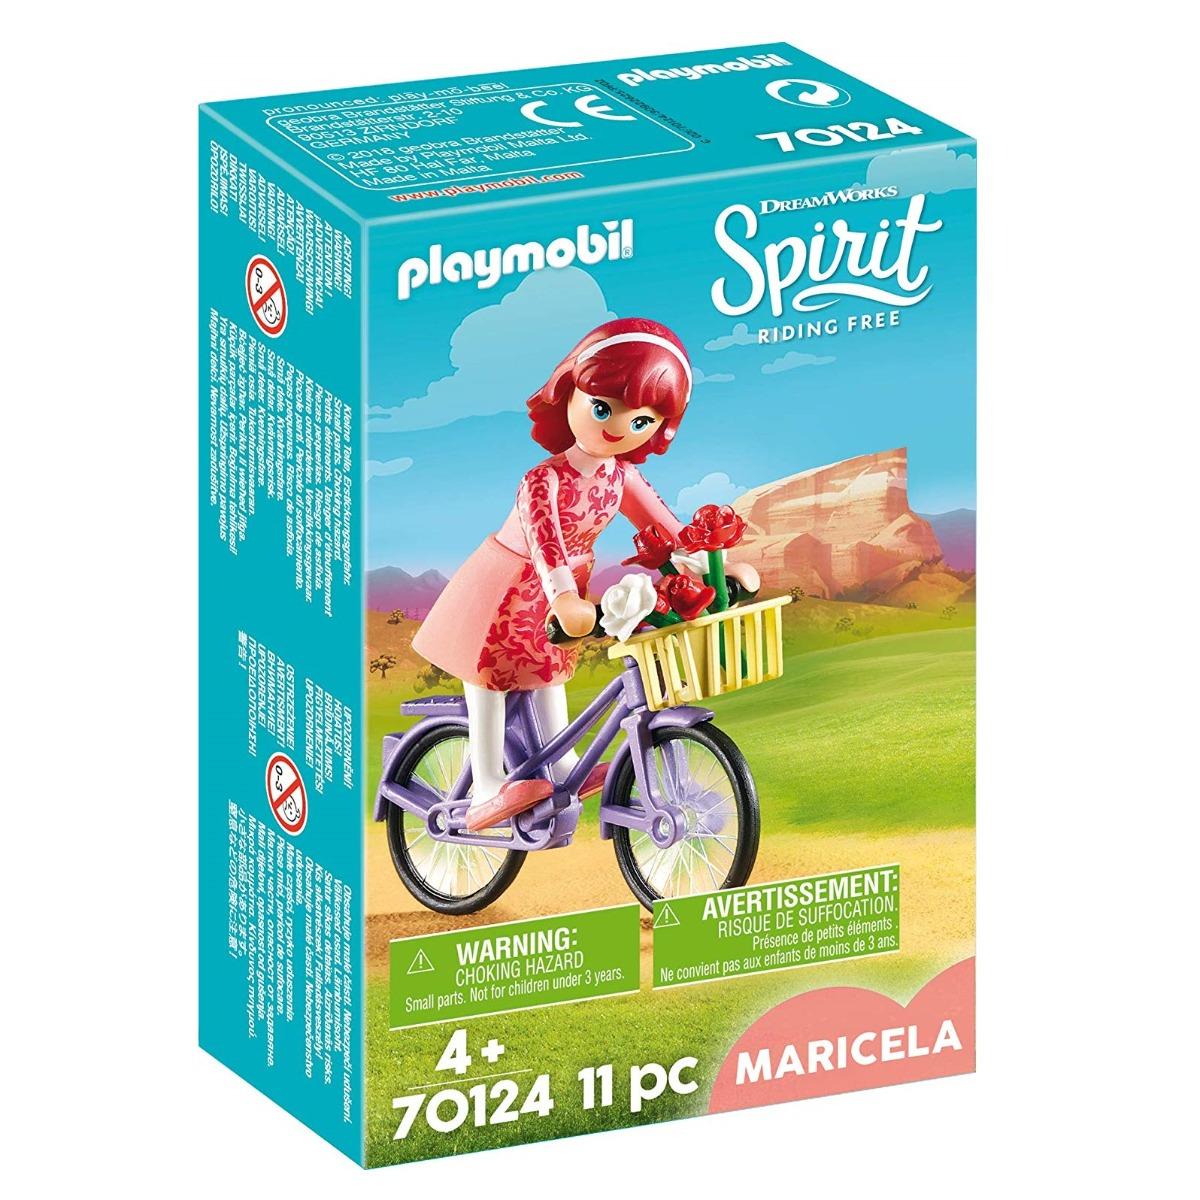 Playmobil PM70124 Maricela si bicicleta imagine hippoland.ro